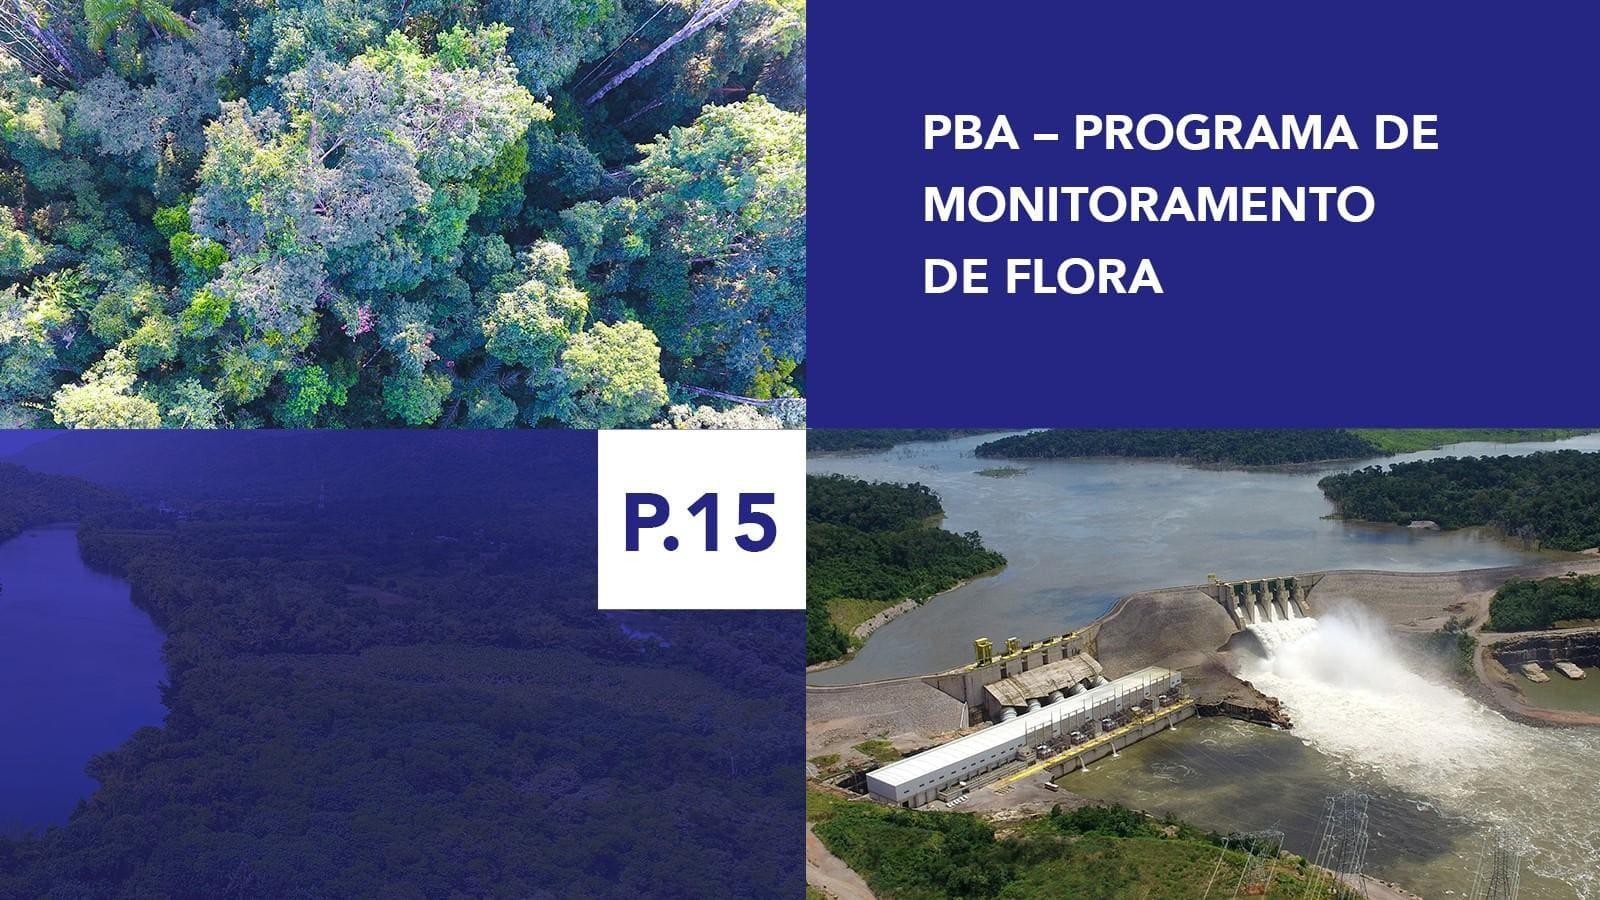 P.15 - Programa de Monitoramento de Flora